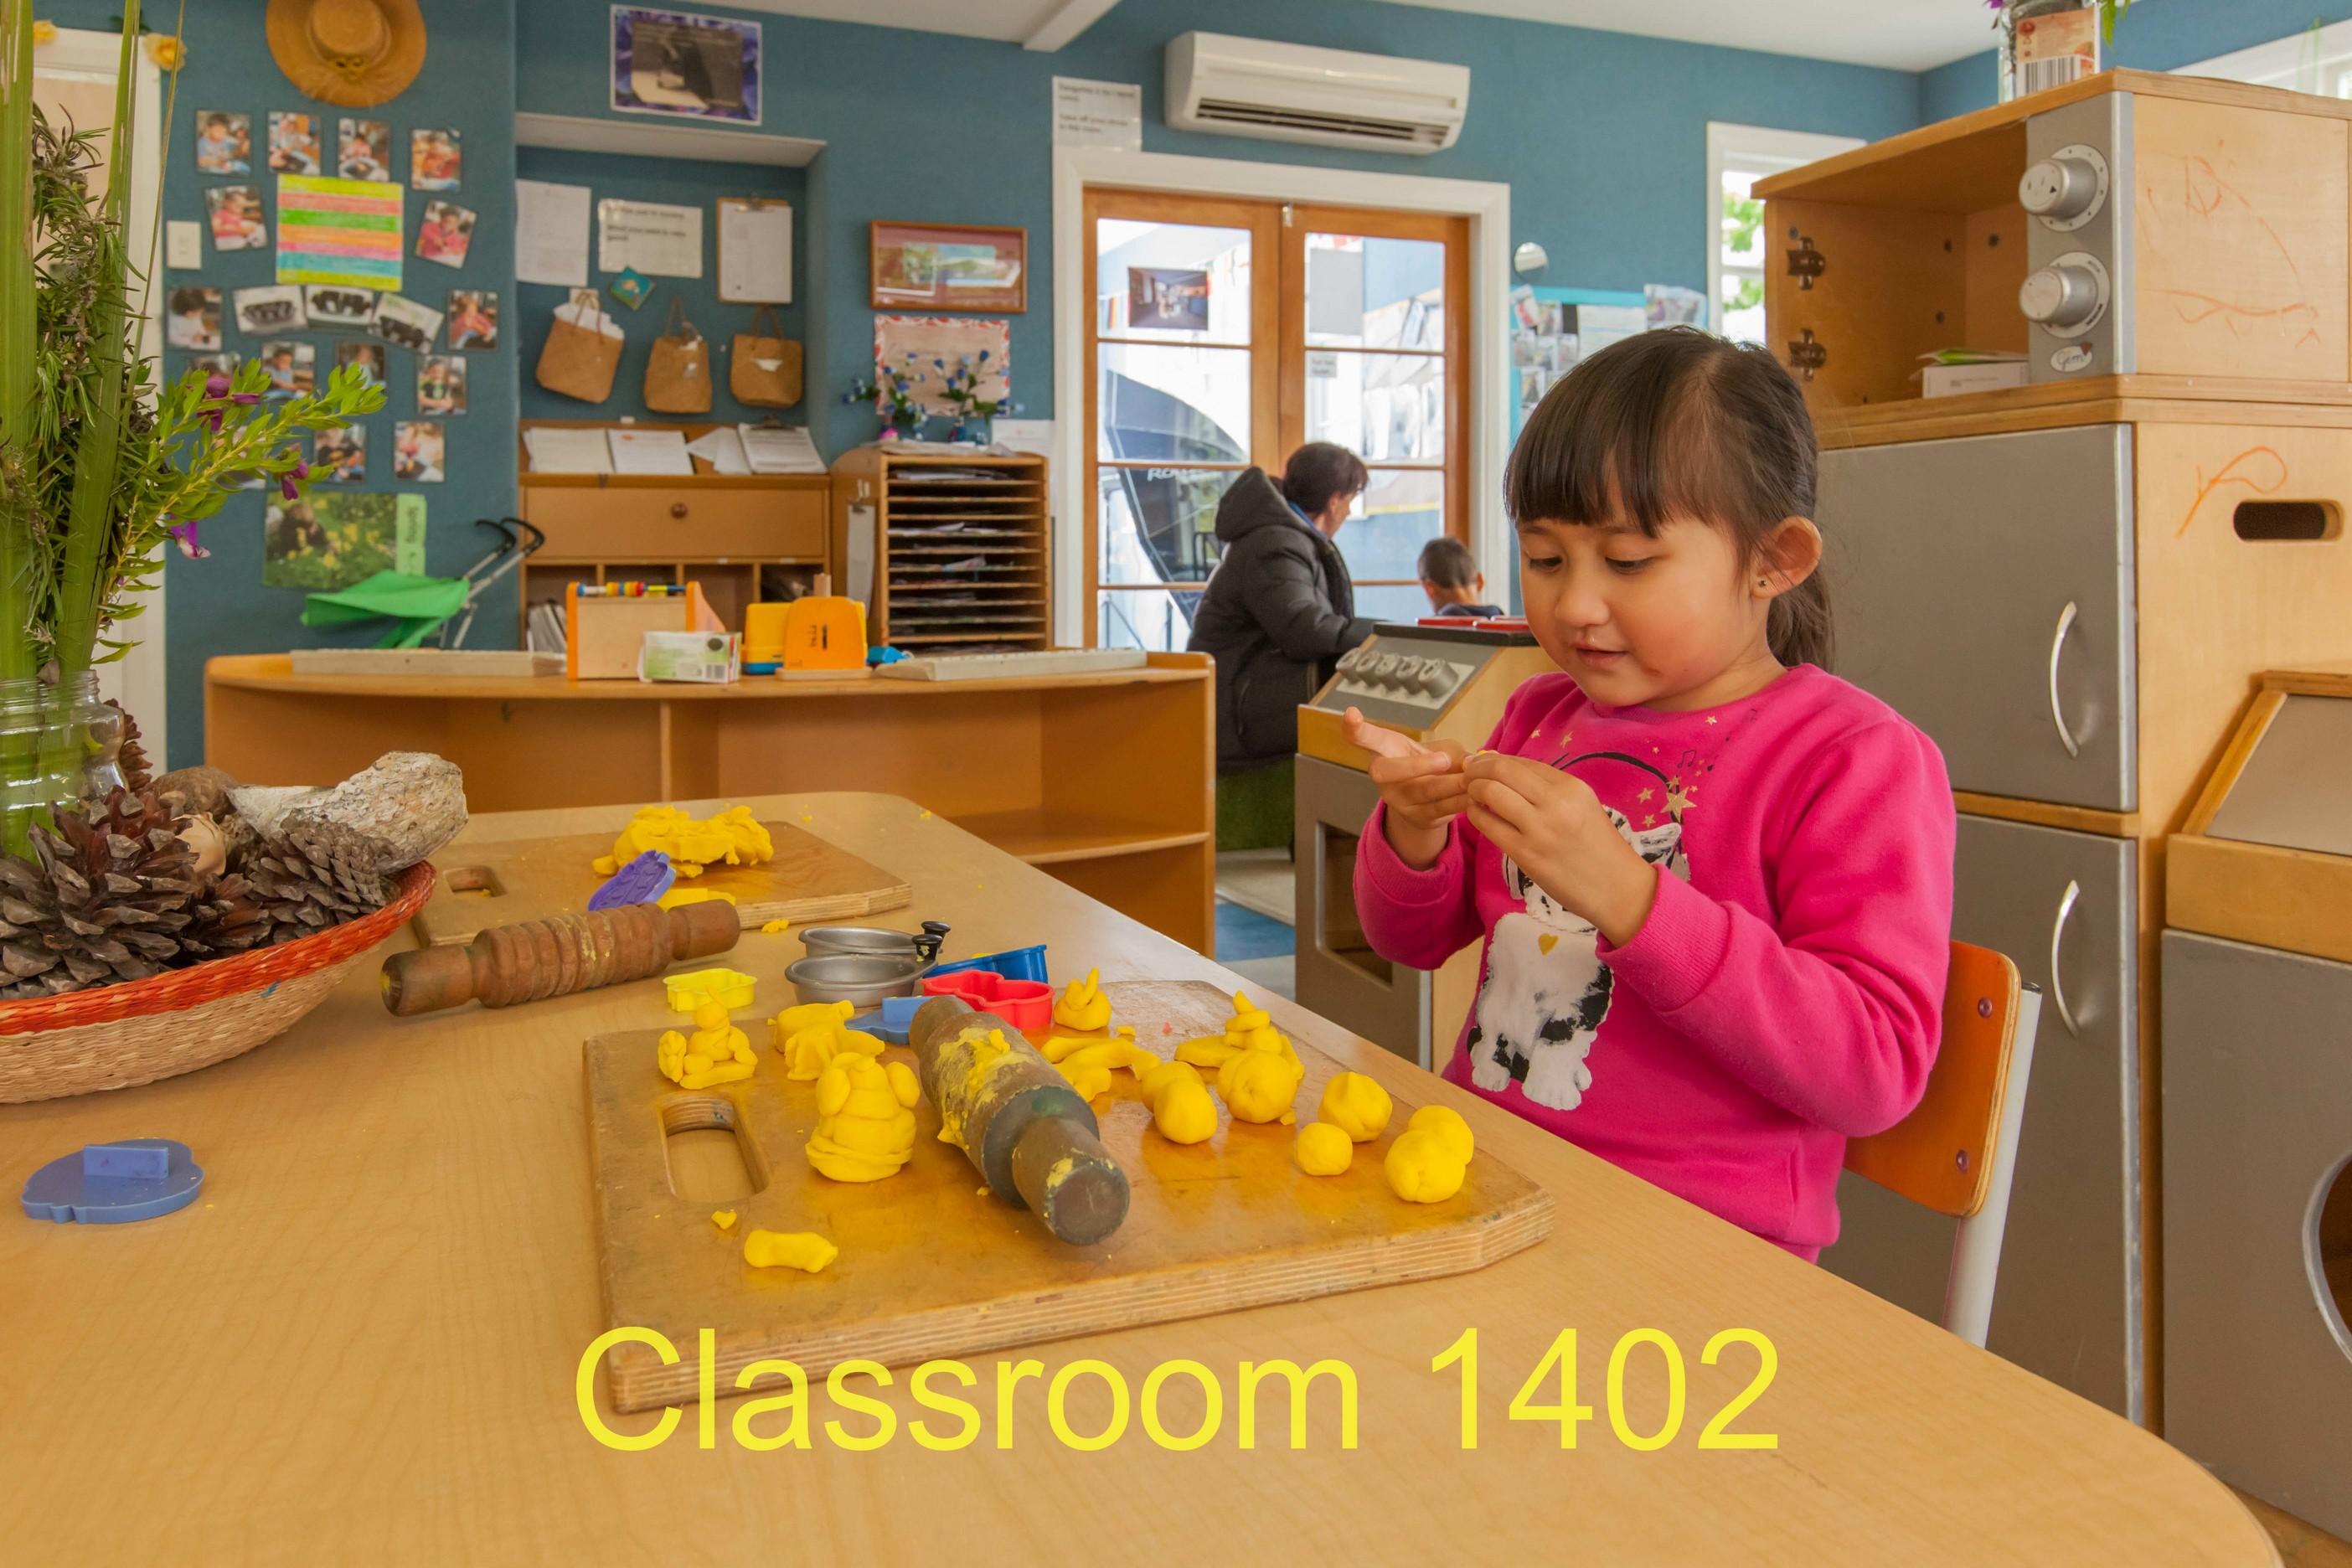 Classroom 1402